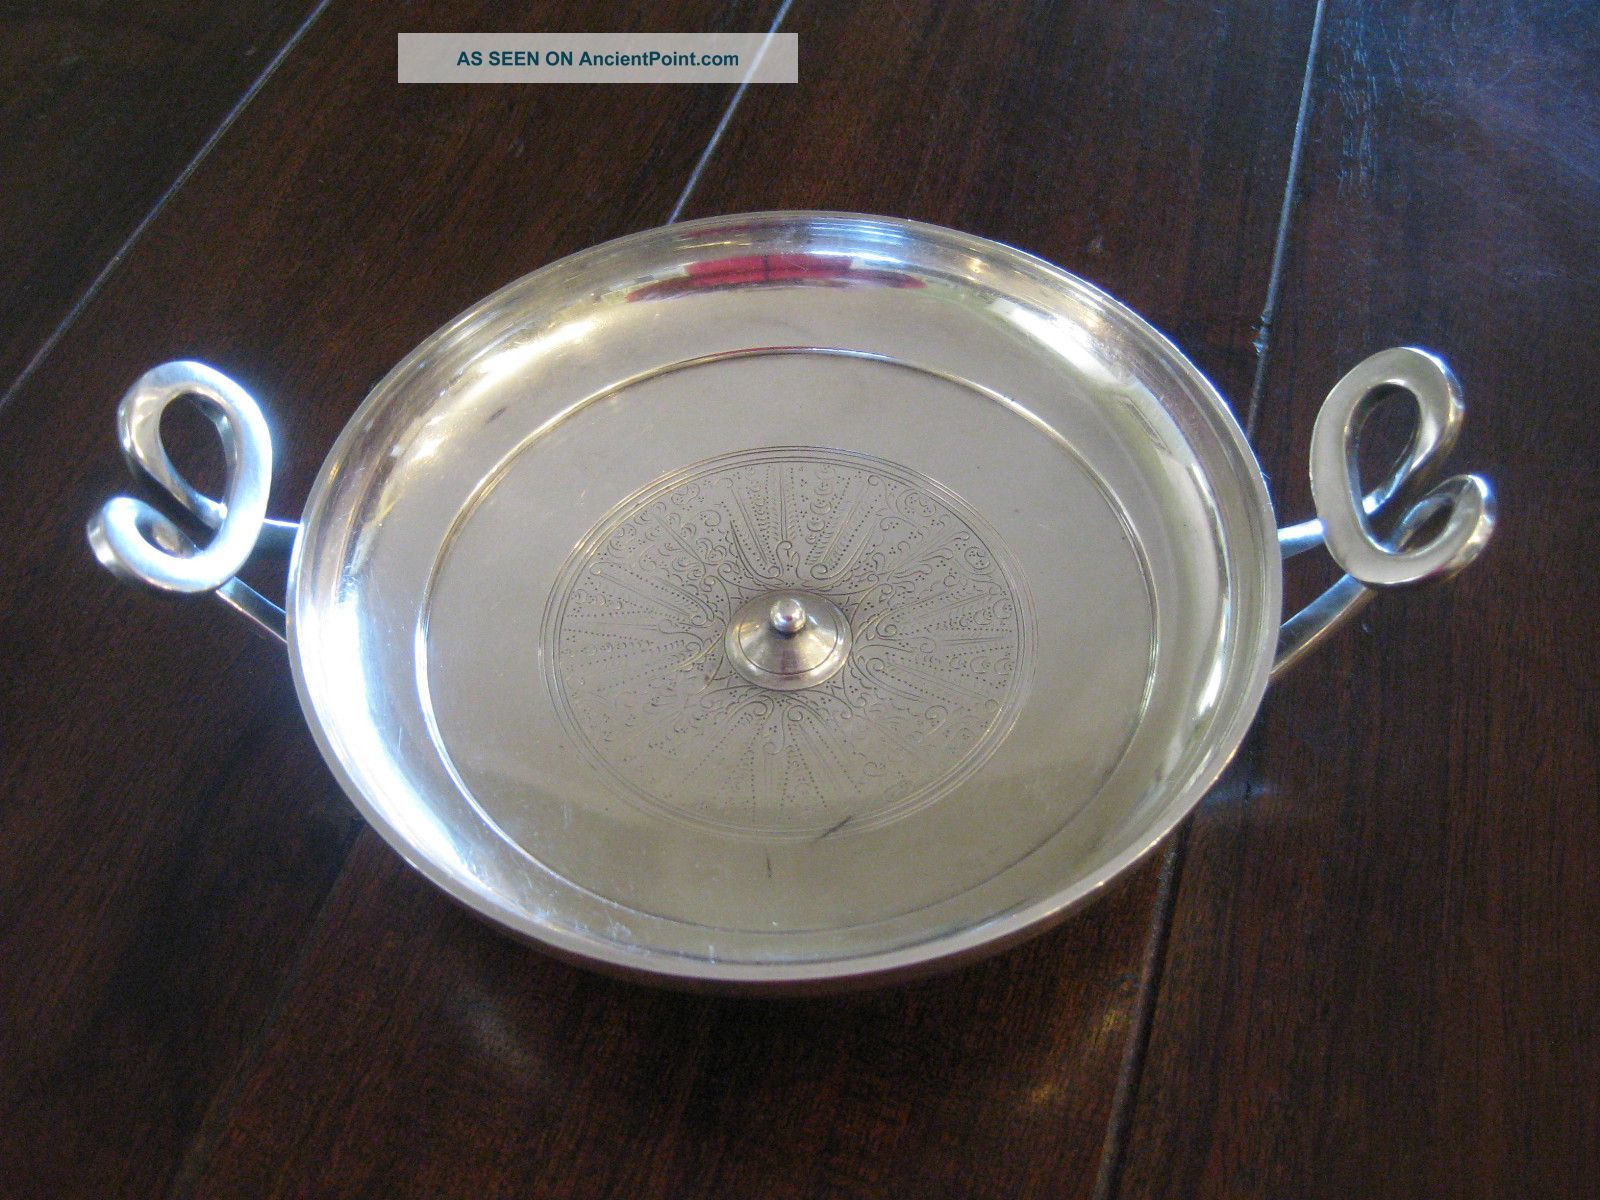 Gorham Greek Kylix Silverplate Metropolitan Museum Of Art Antique Bowl Bowls photo